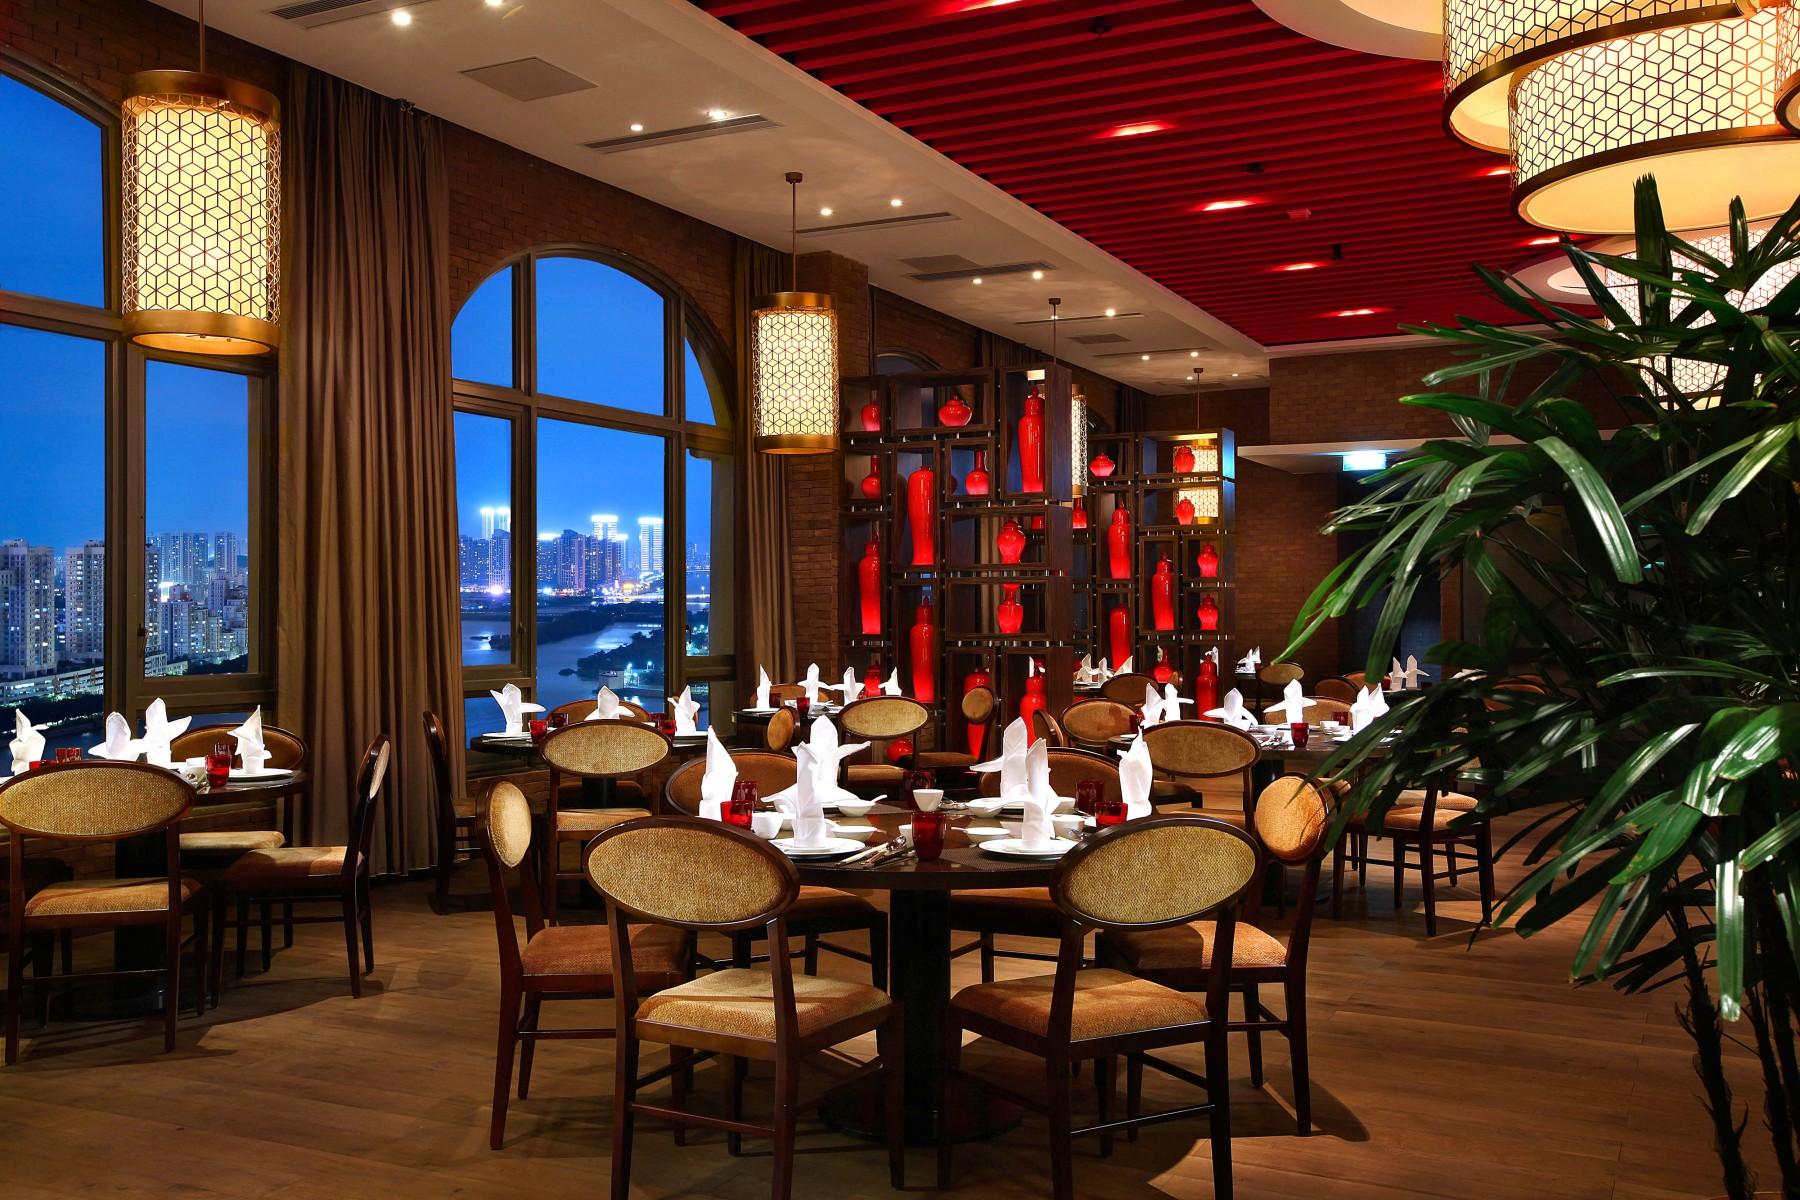 Bar Le French Flair le chinois restaurant - sofitel macau at ponte 16 - 5-star hotel